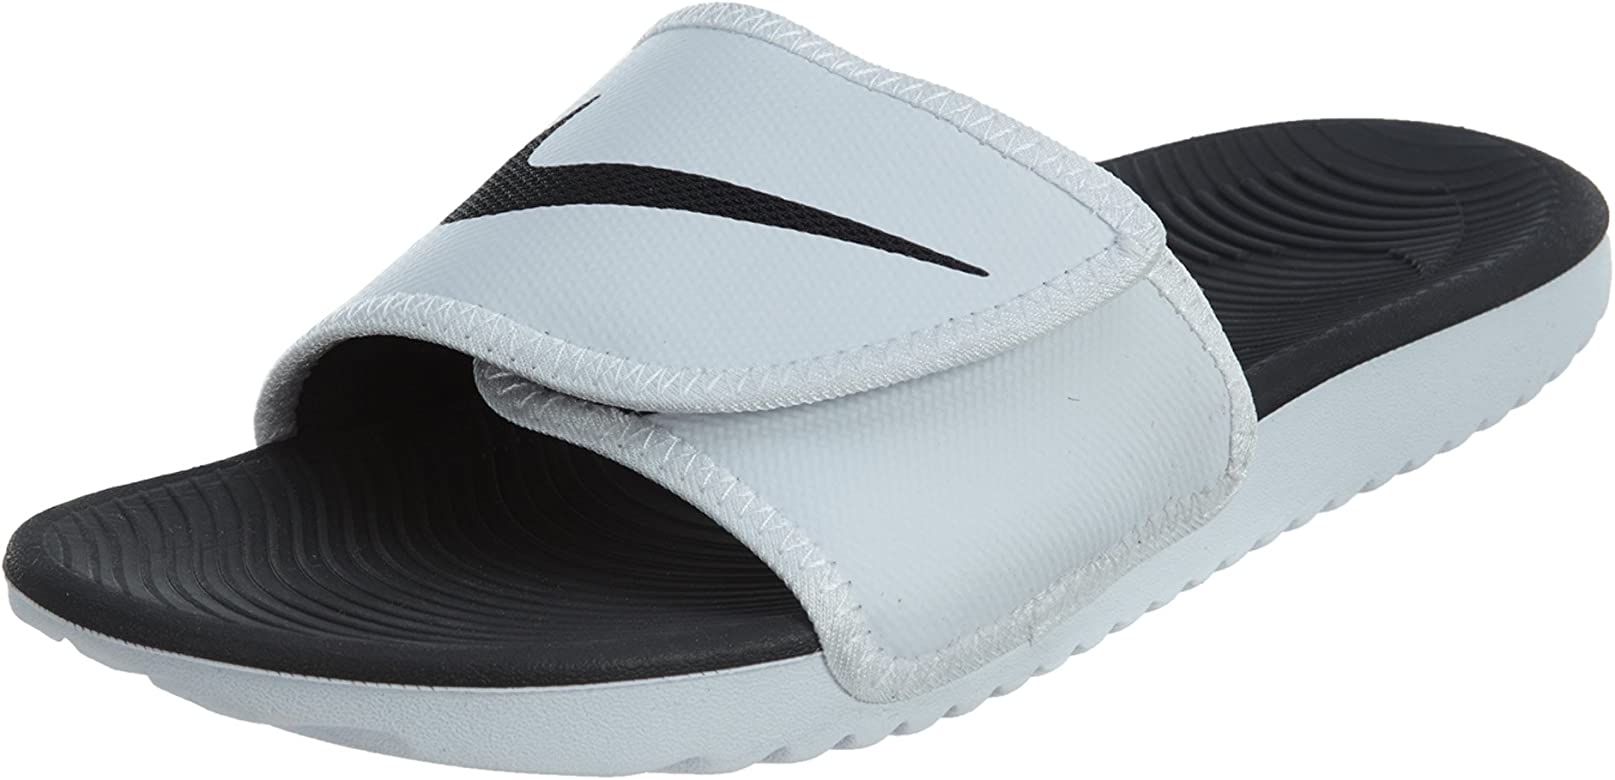 Kawa Adjust Slide White